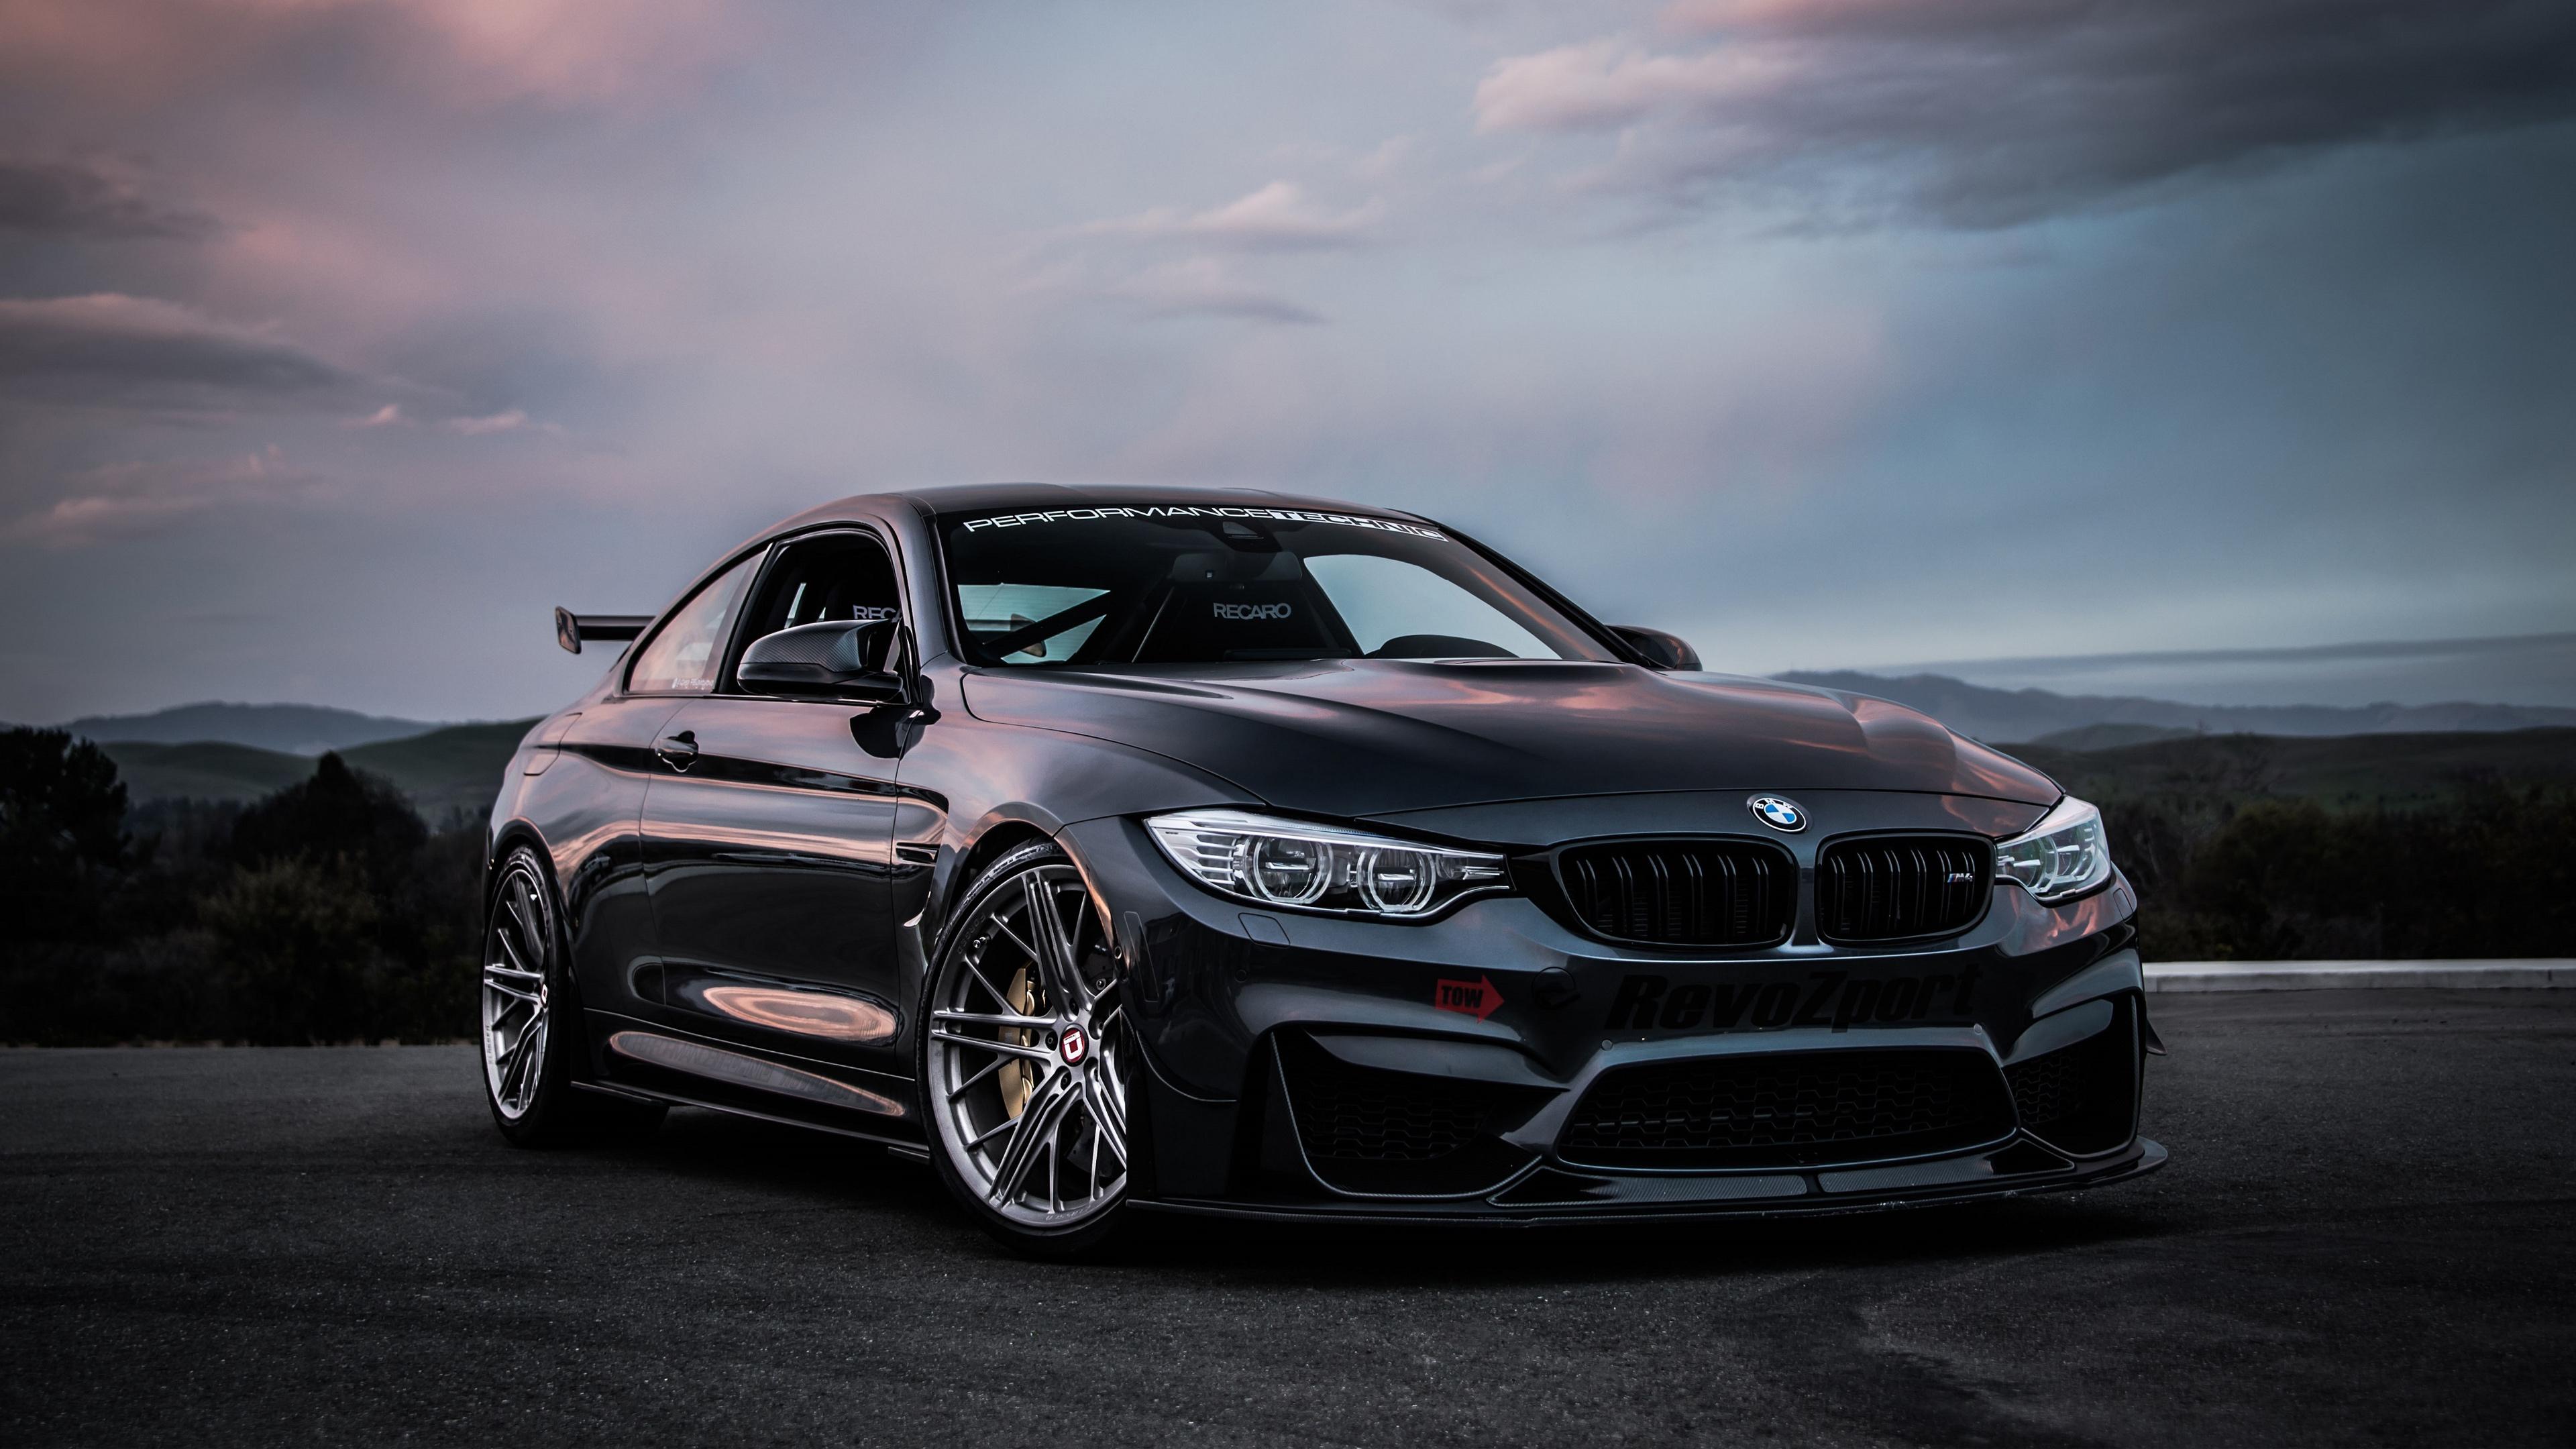 Performance Technic BMW M4 Wallpaper | HD Car Wallpapers ...